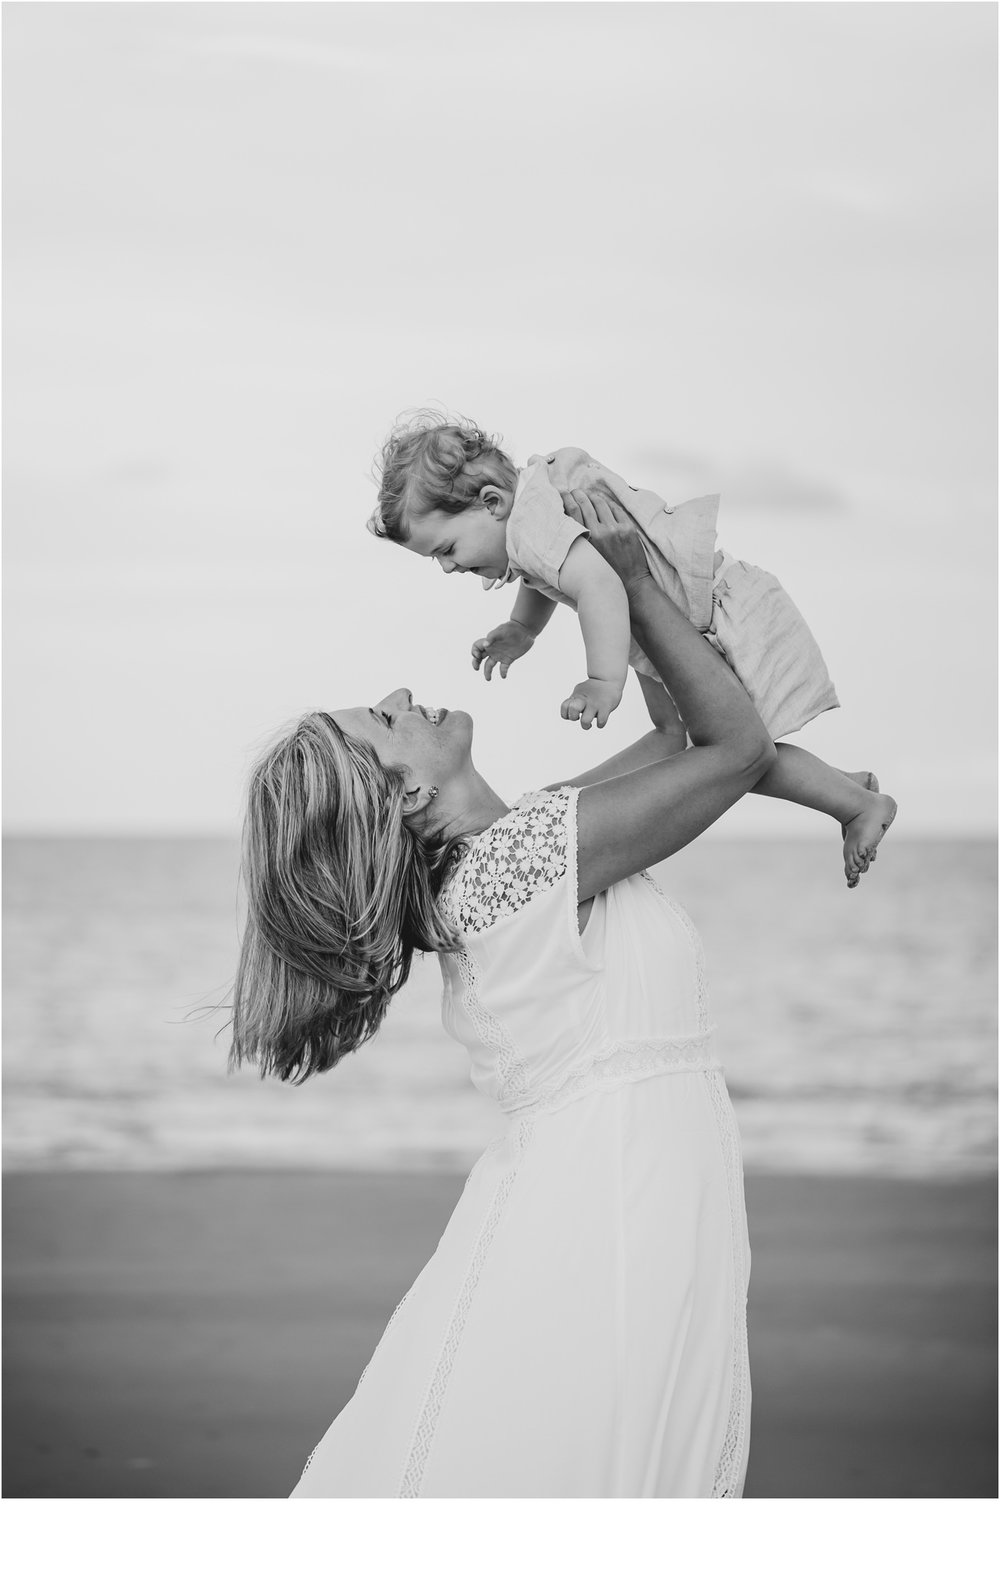 Rainey_Gregg_Photography_St._Simons_Island_Georgia_California_Wedding_Portrait_Photography_1036.jpg